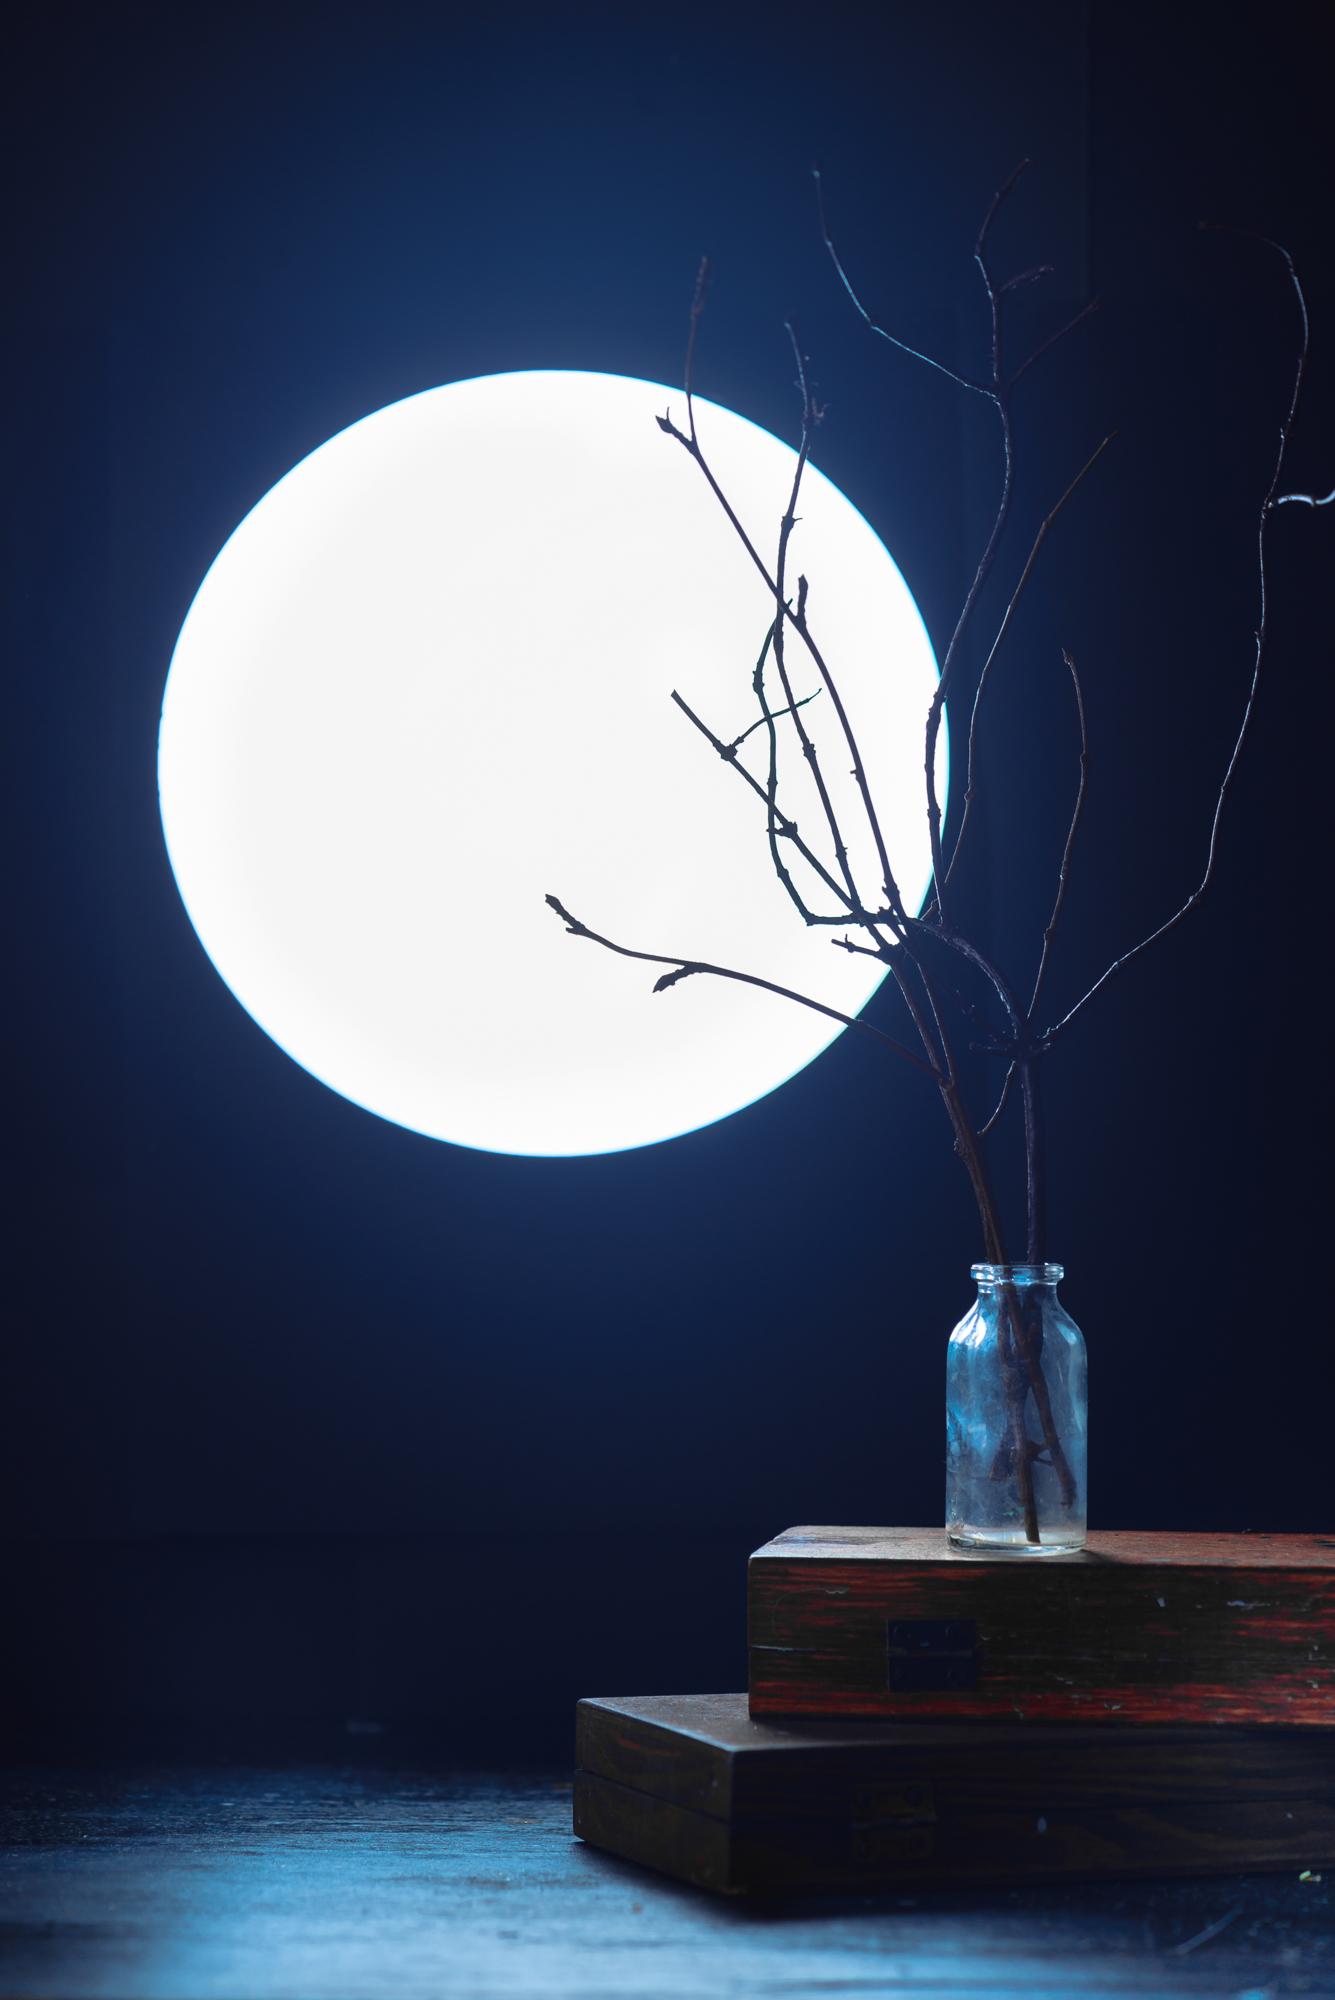 500px_blog_Halloween_still_life_moon